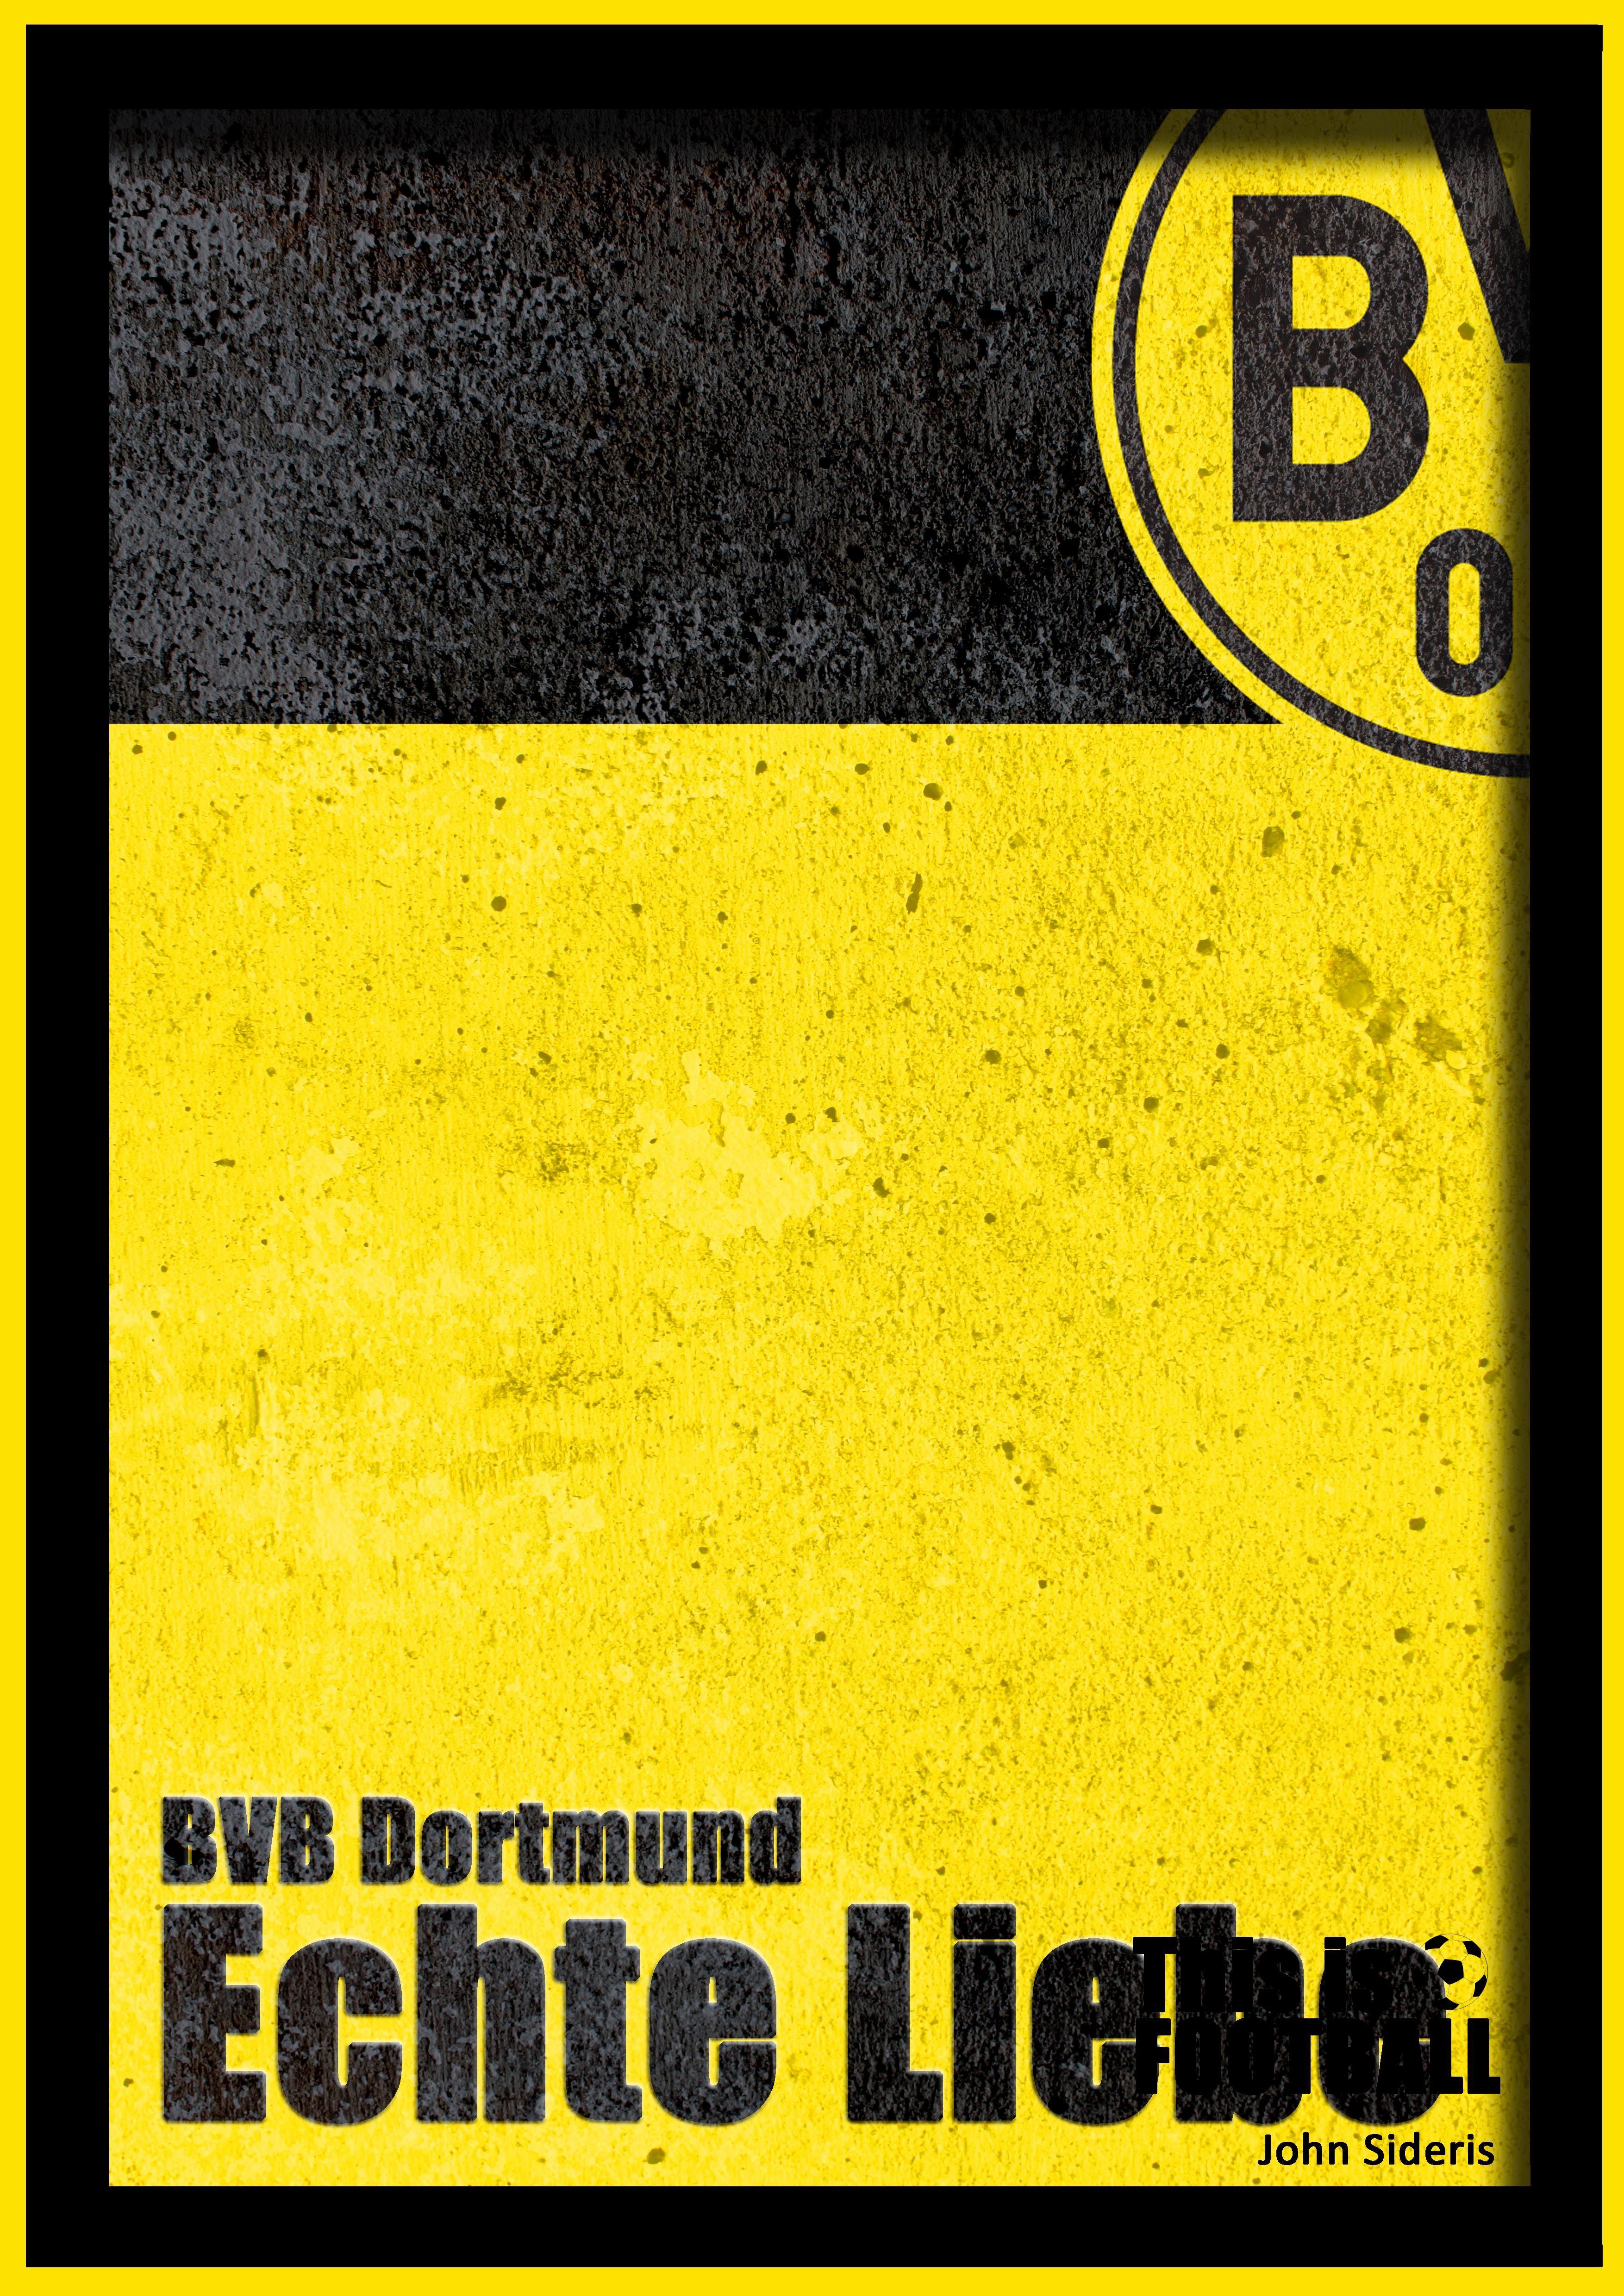 Pin Von Praveen Auf We Bvb 09 Bvb Dortmund Borussia Dortmund Dortmund